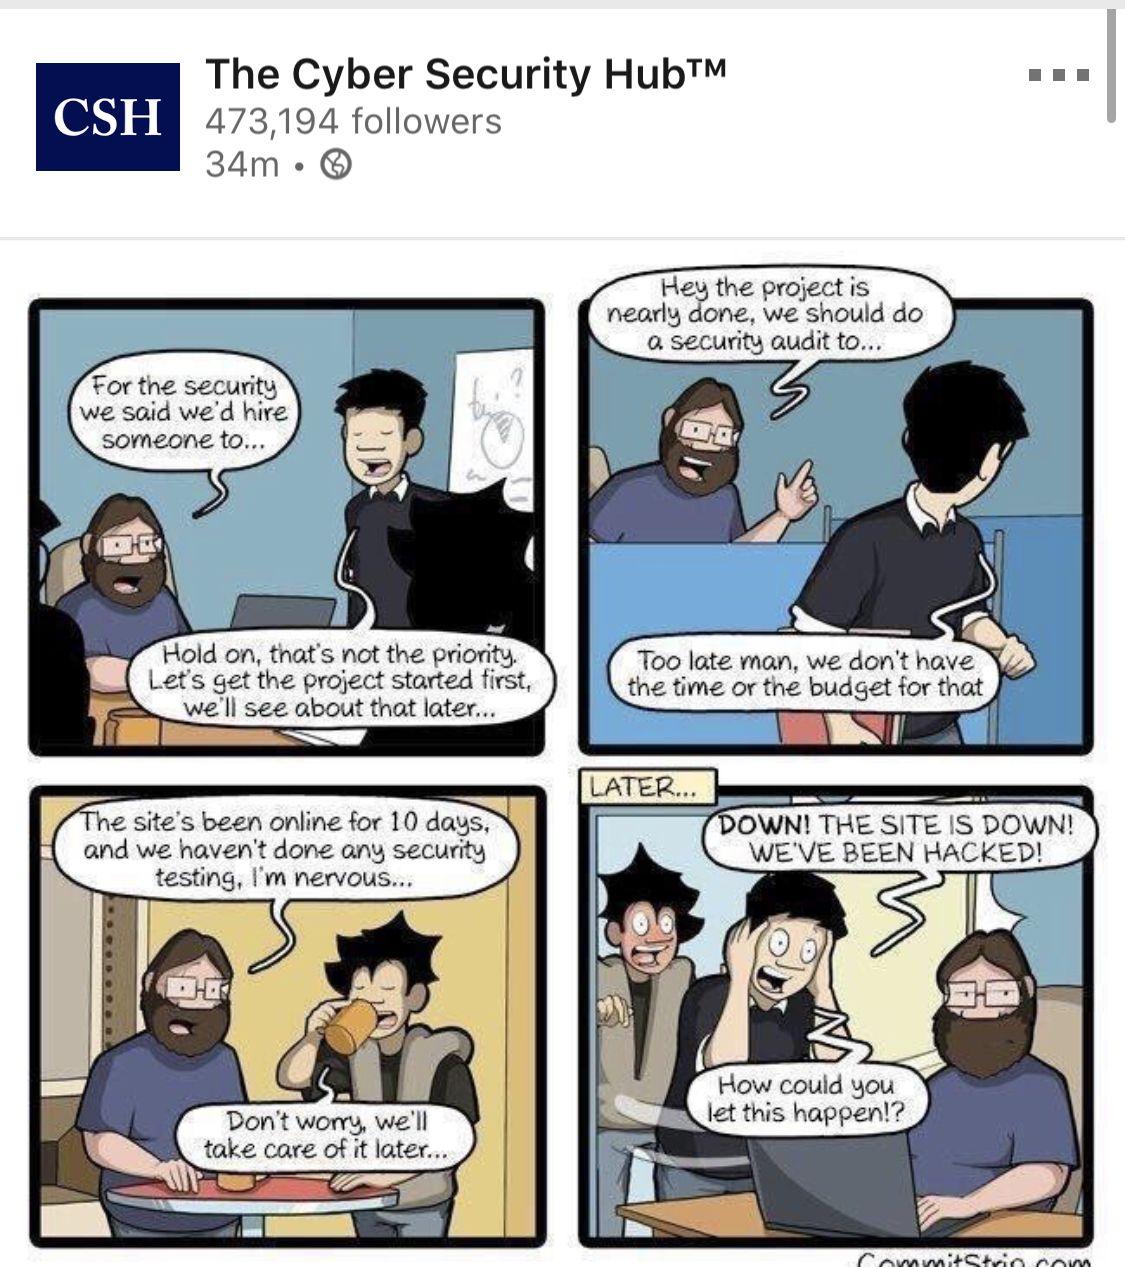 Cyber security image by Jordan Kassing on InfoSec